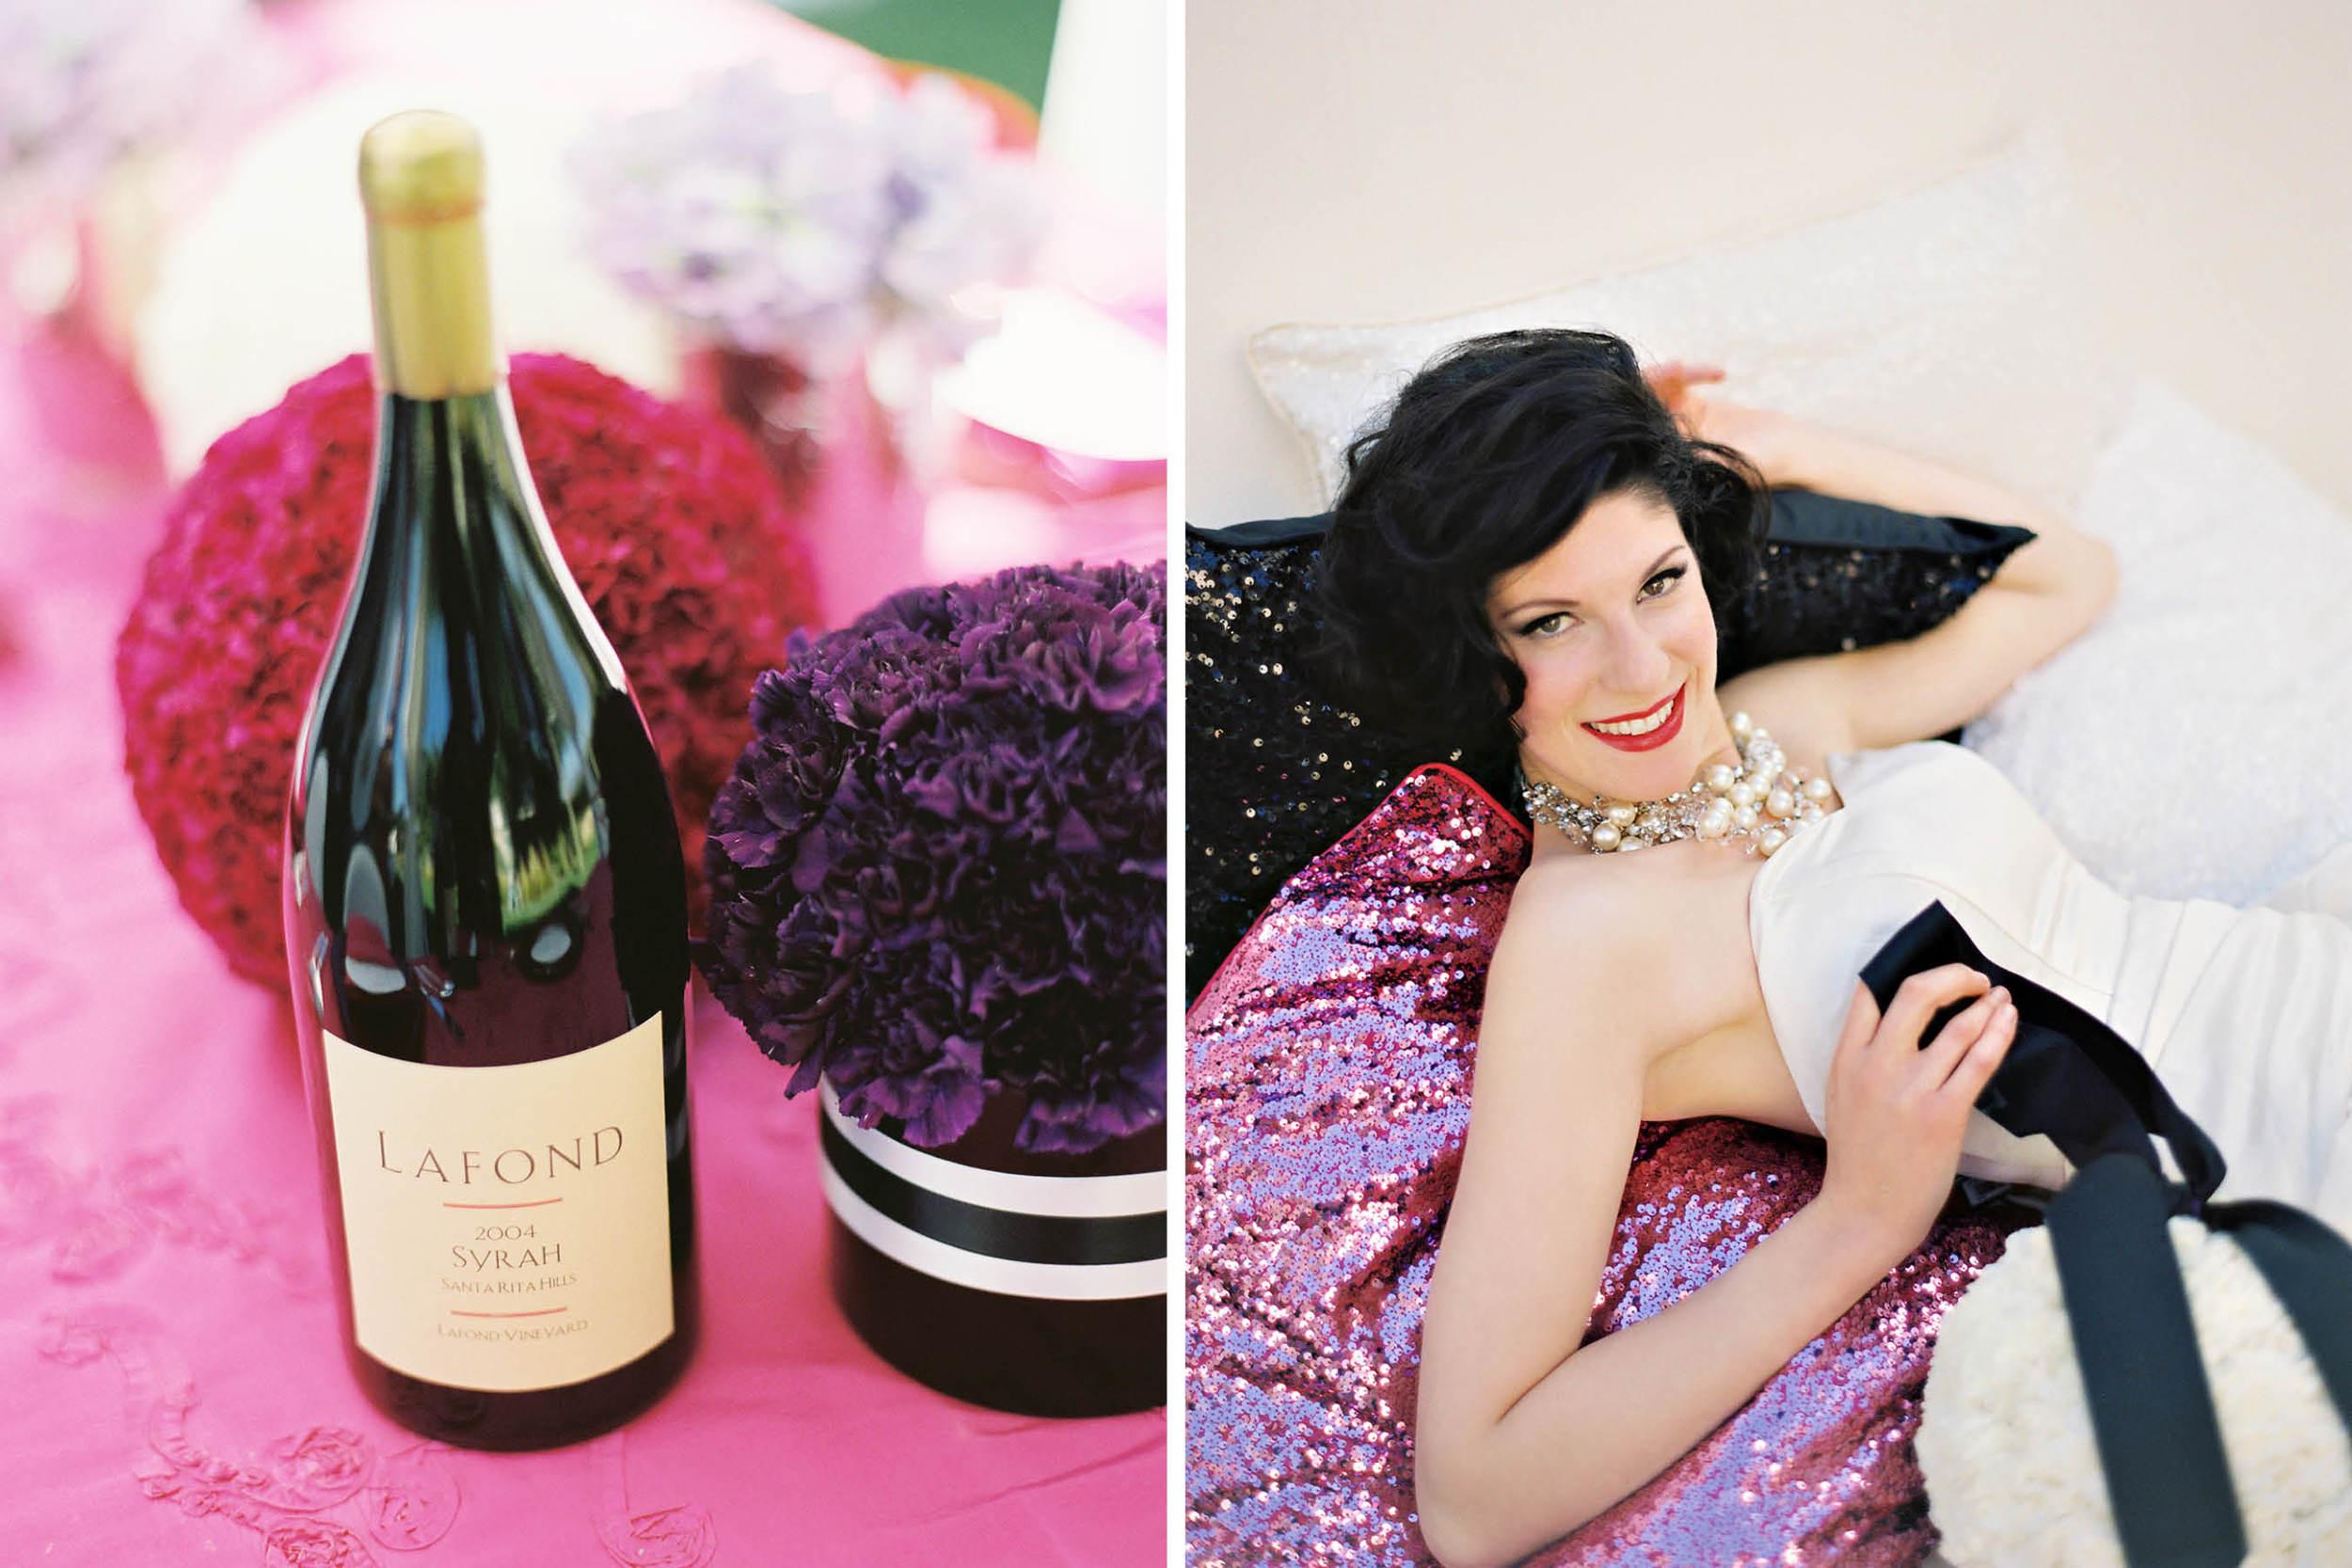 alegria-by-design-wedding-planner-coordination-santa-barbara-lafond-winery (12).jpg